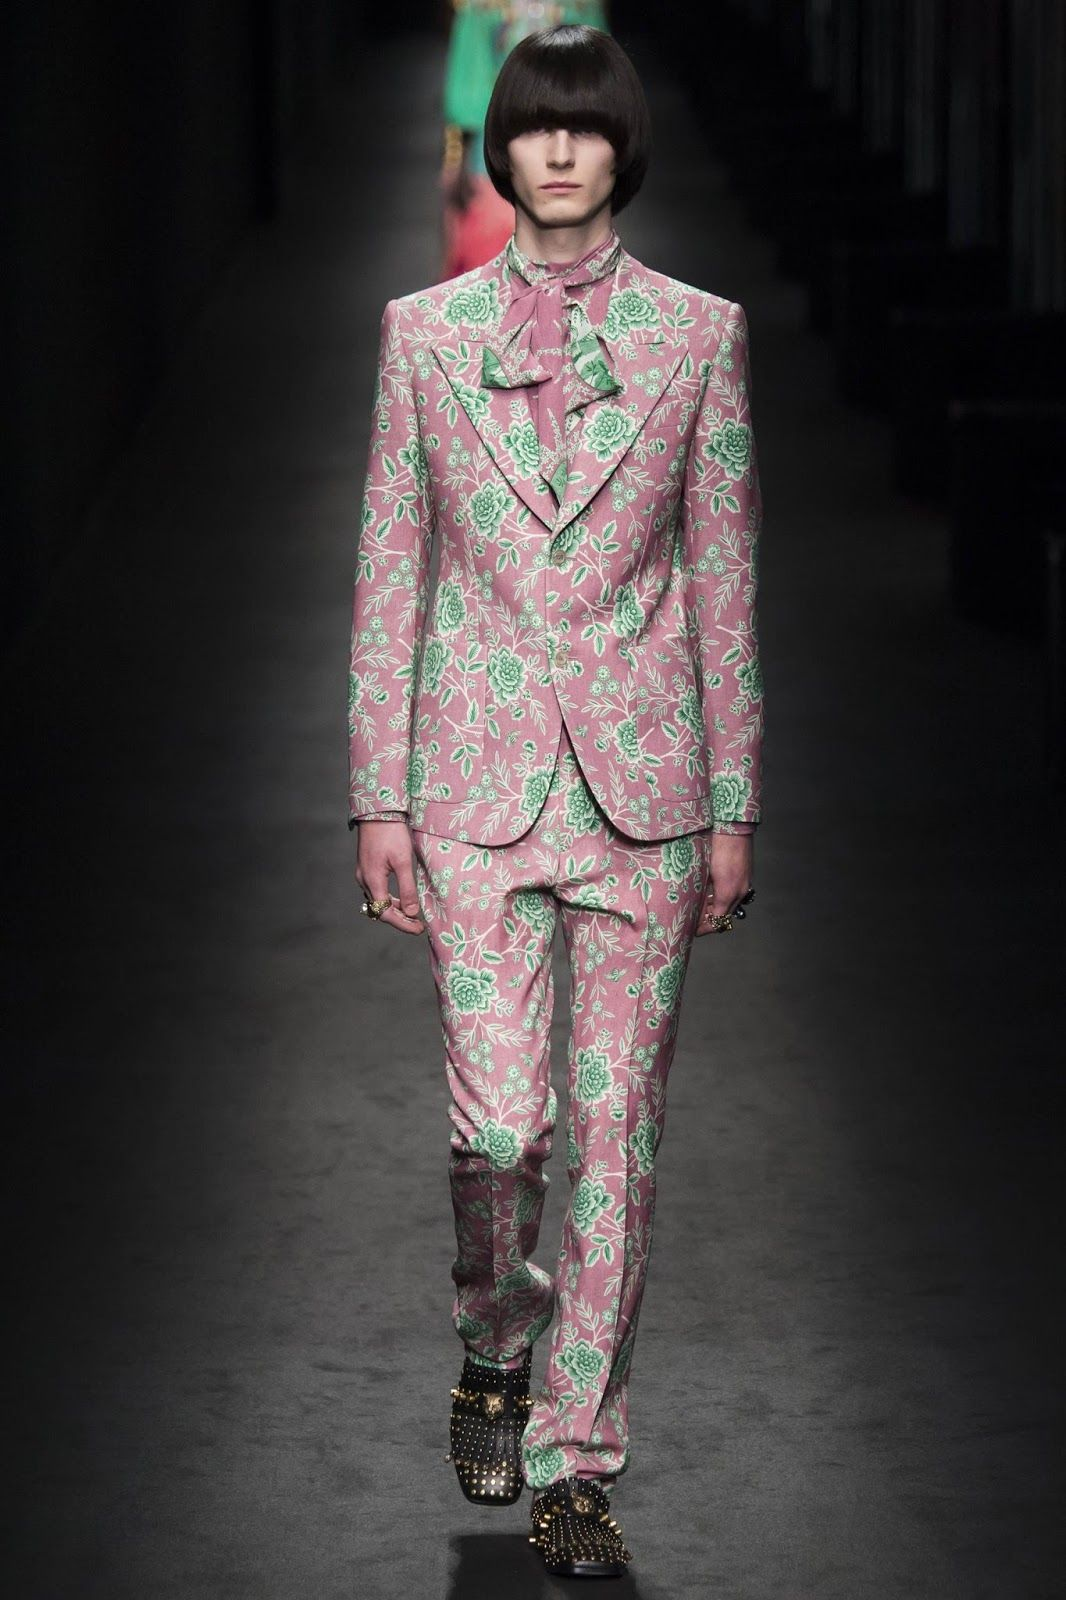 Gucci Fall/Winter 2016/2017 -Milan Fashion Week